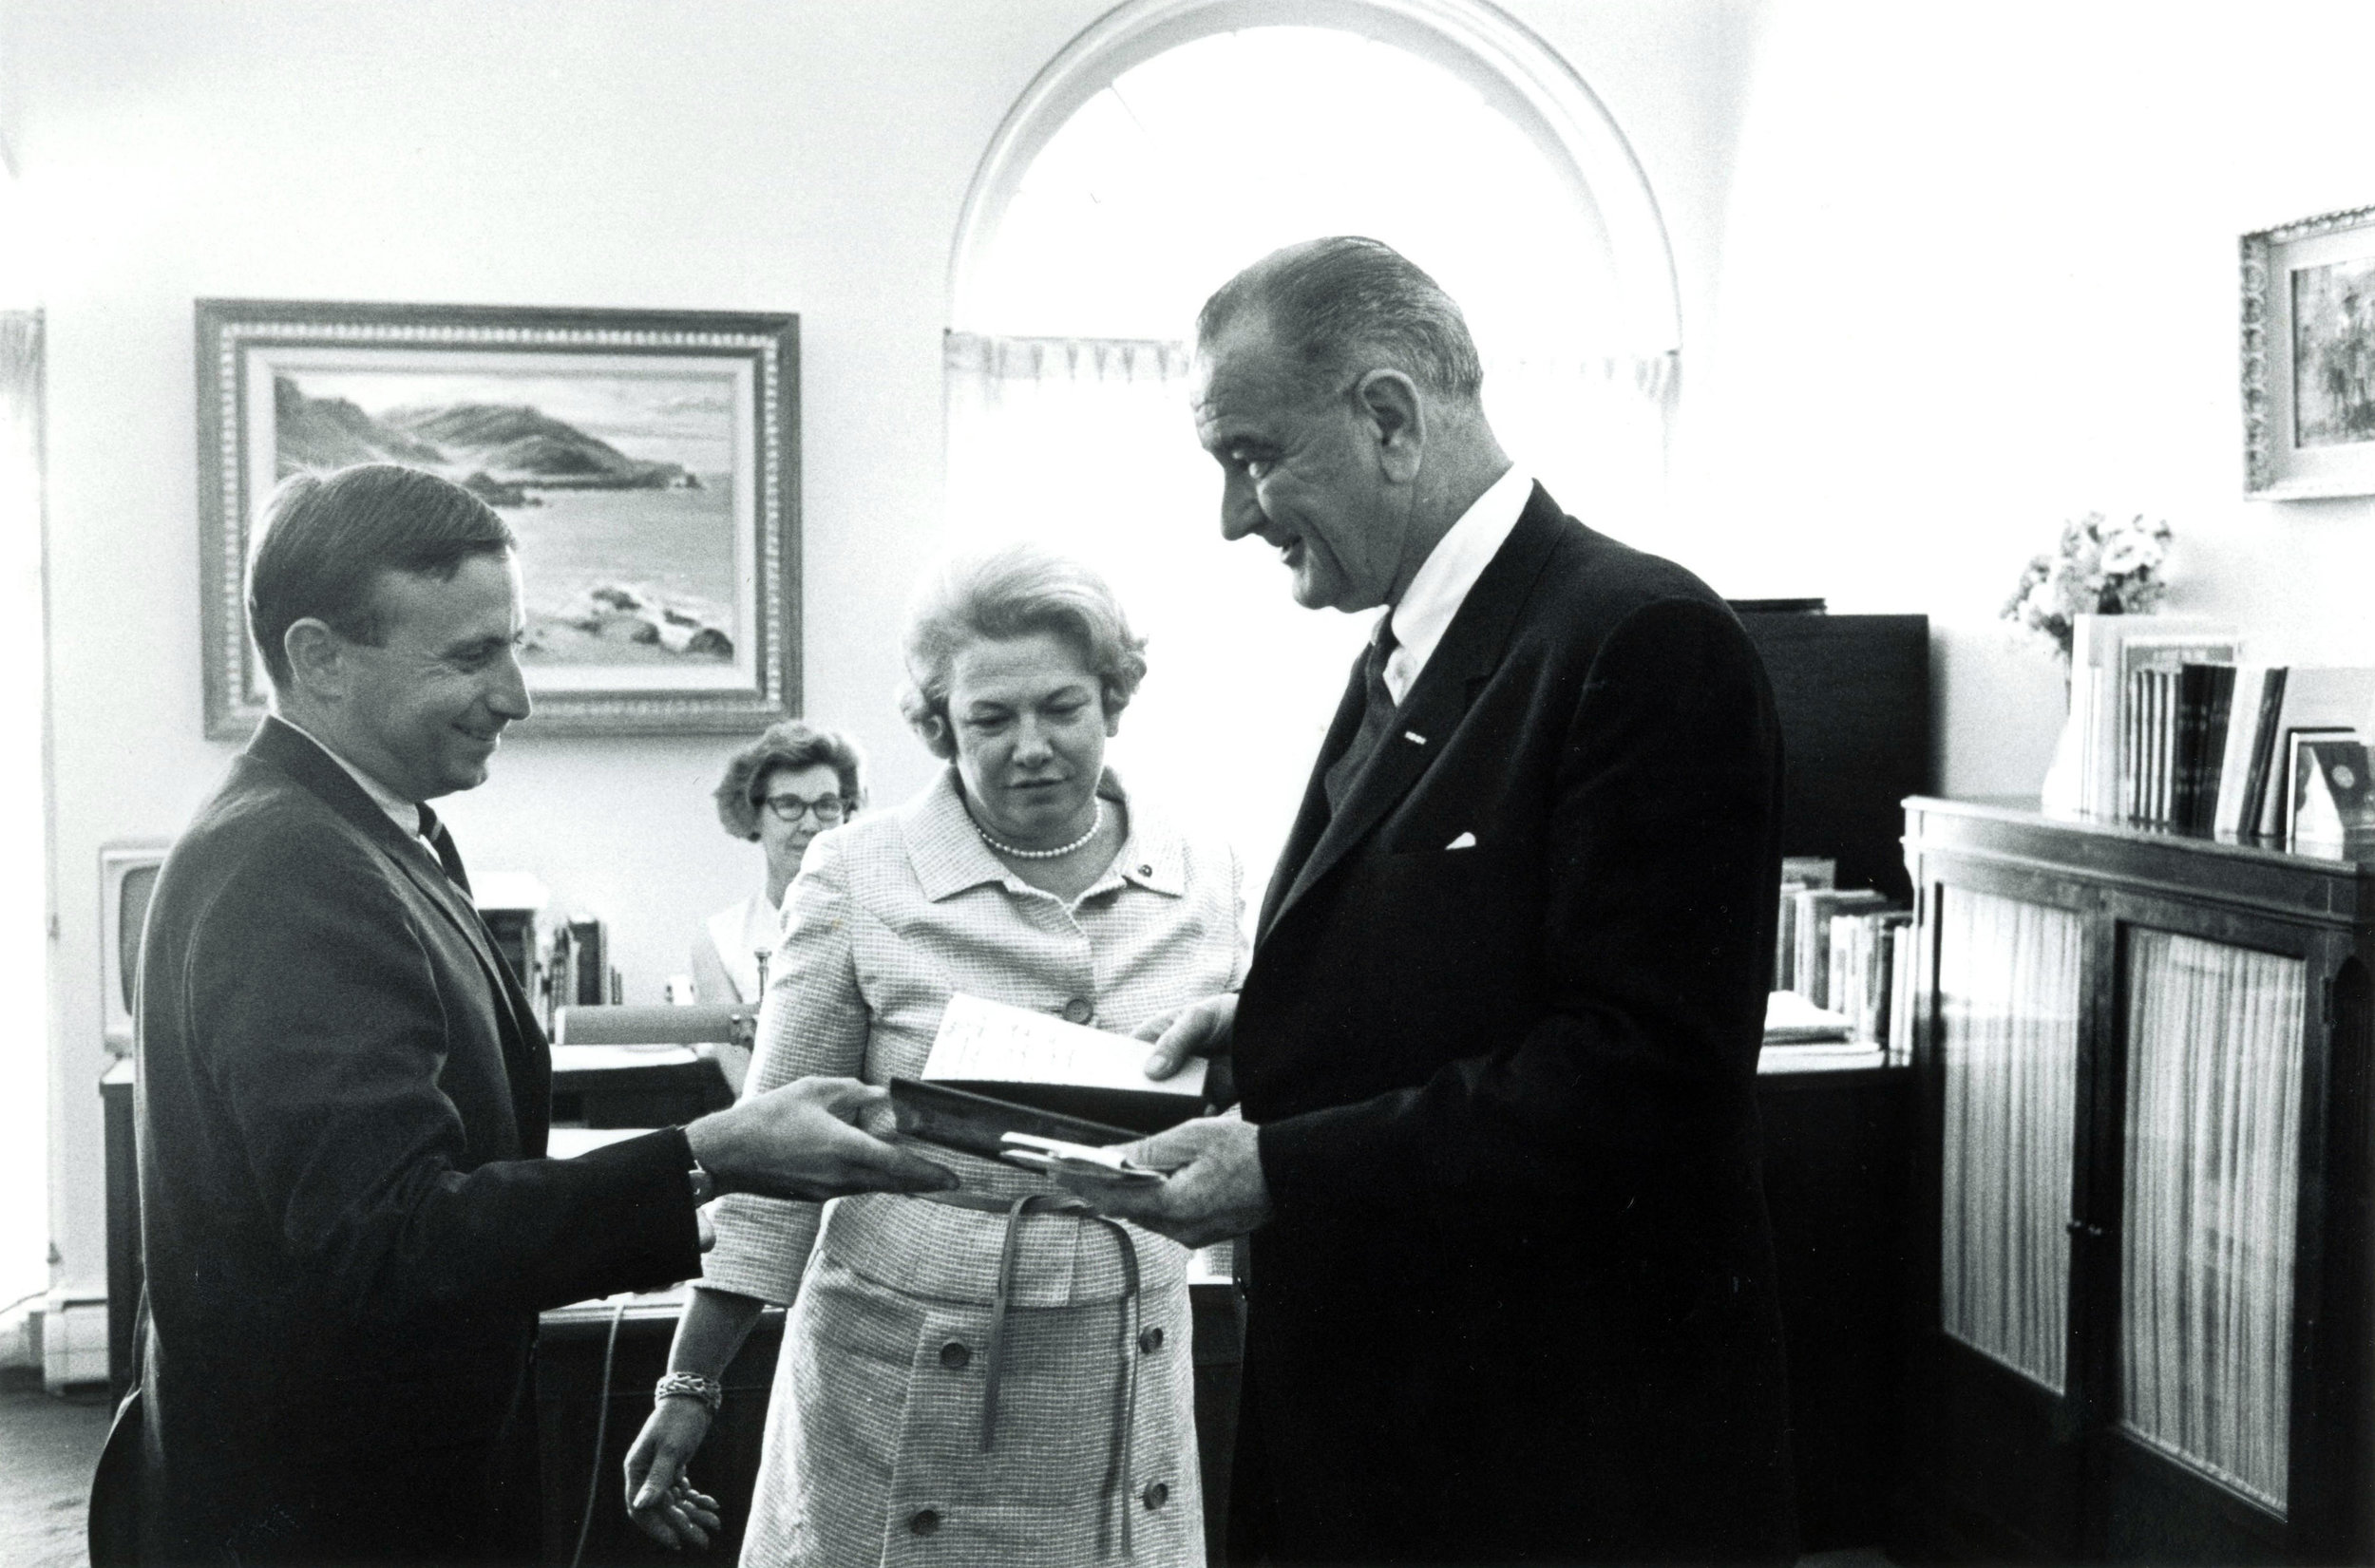 Credit: LBJ Library Photo